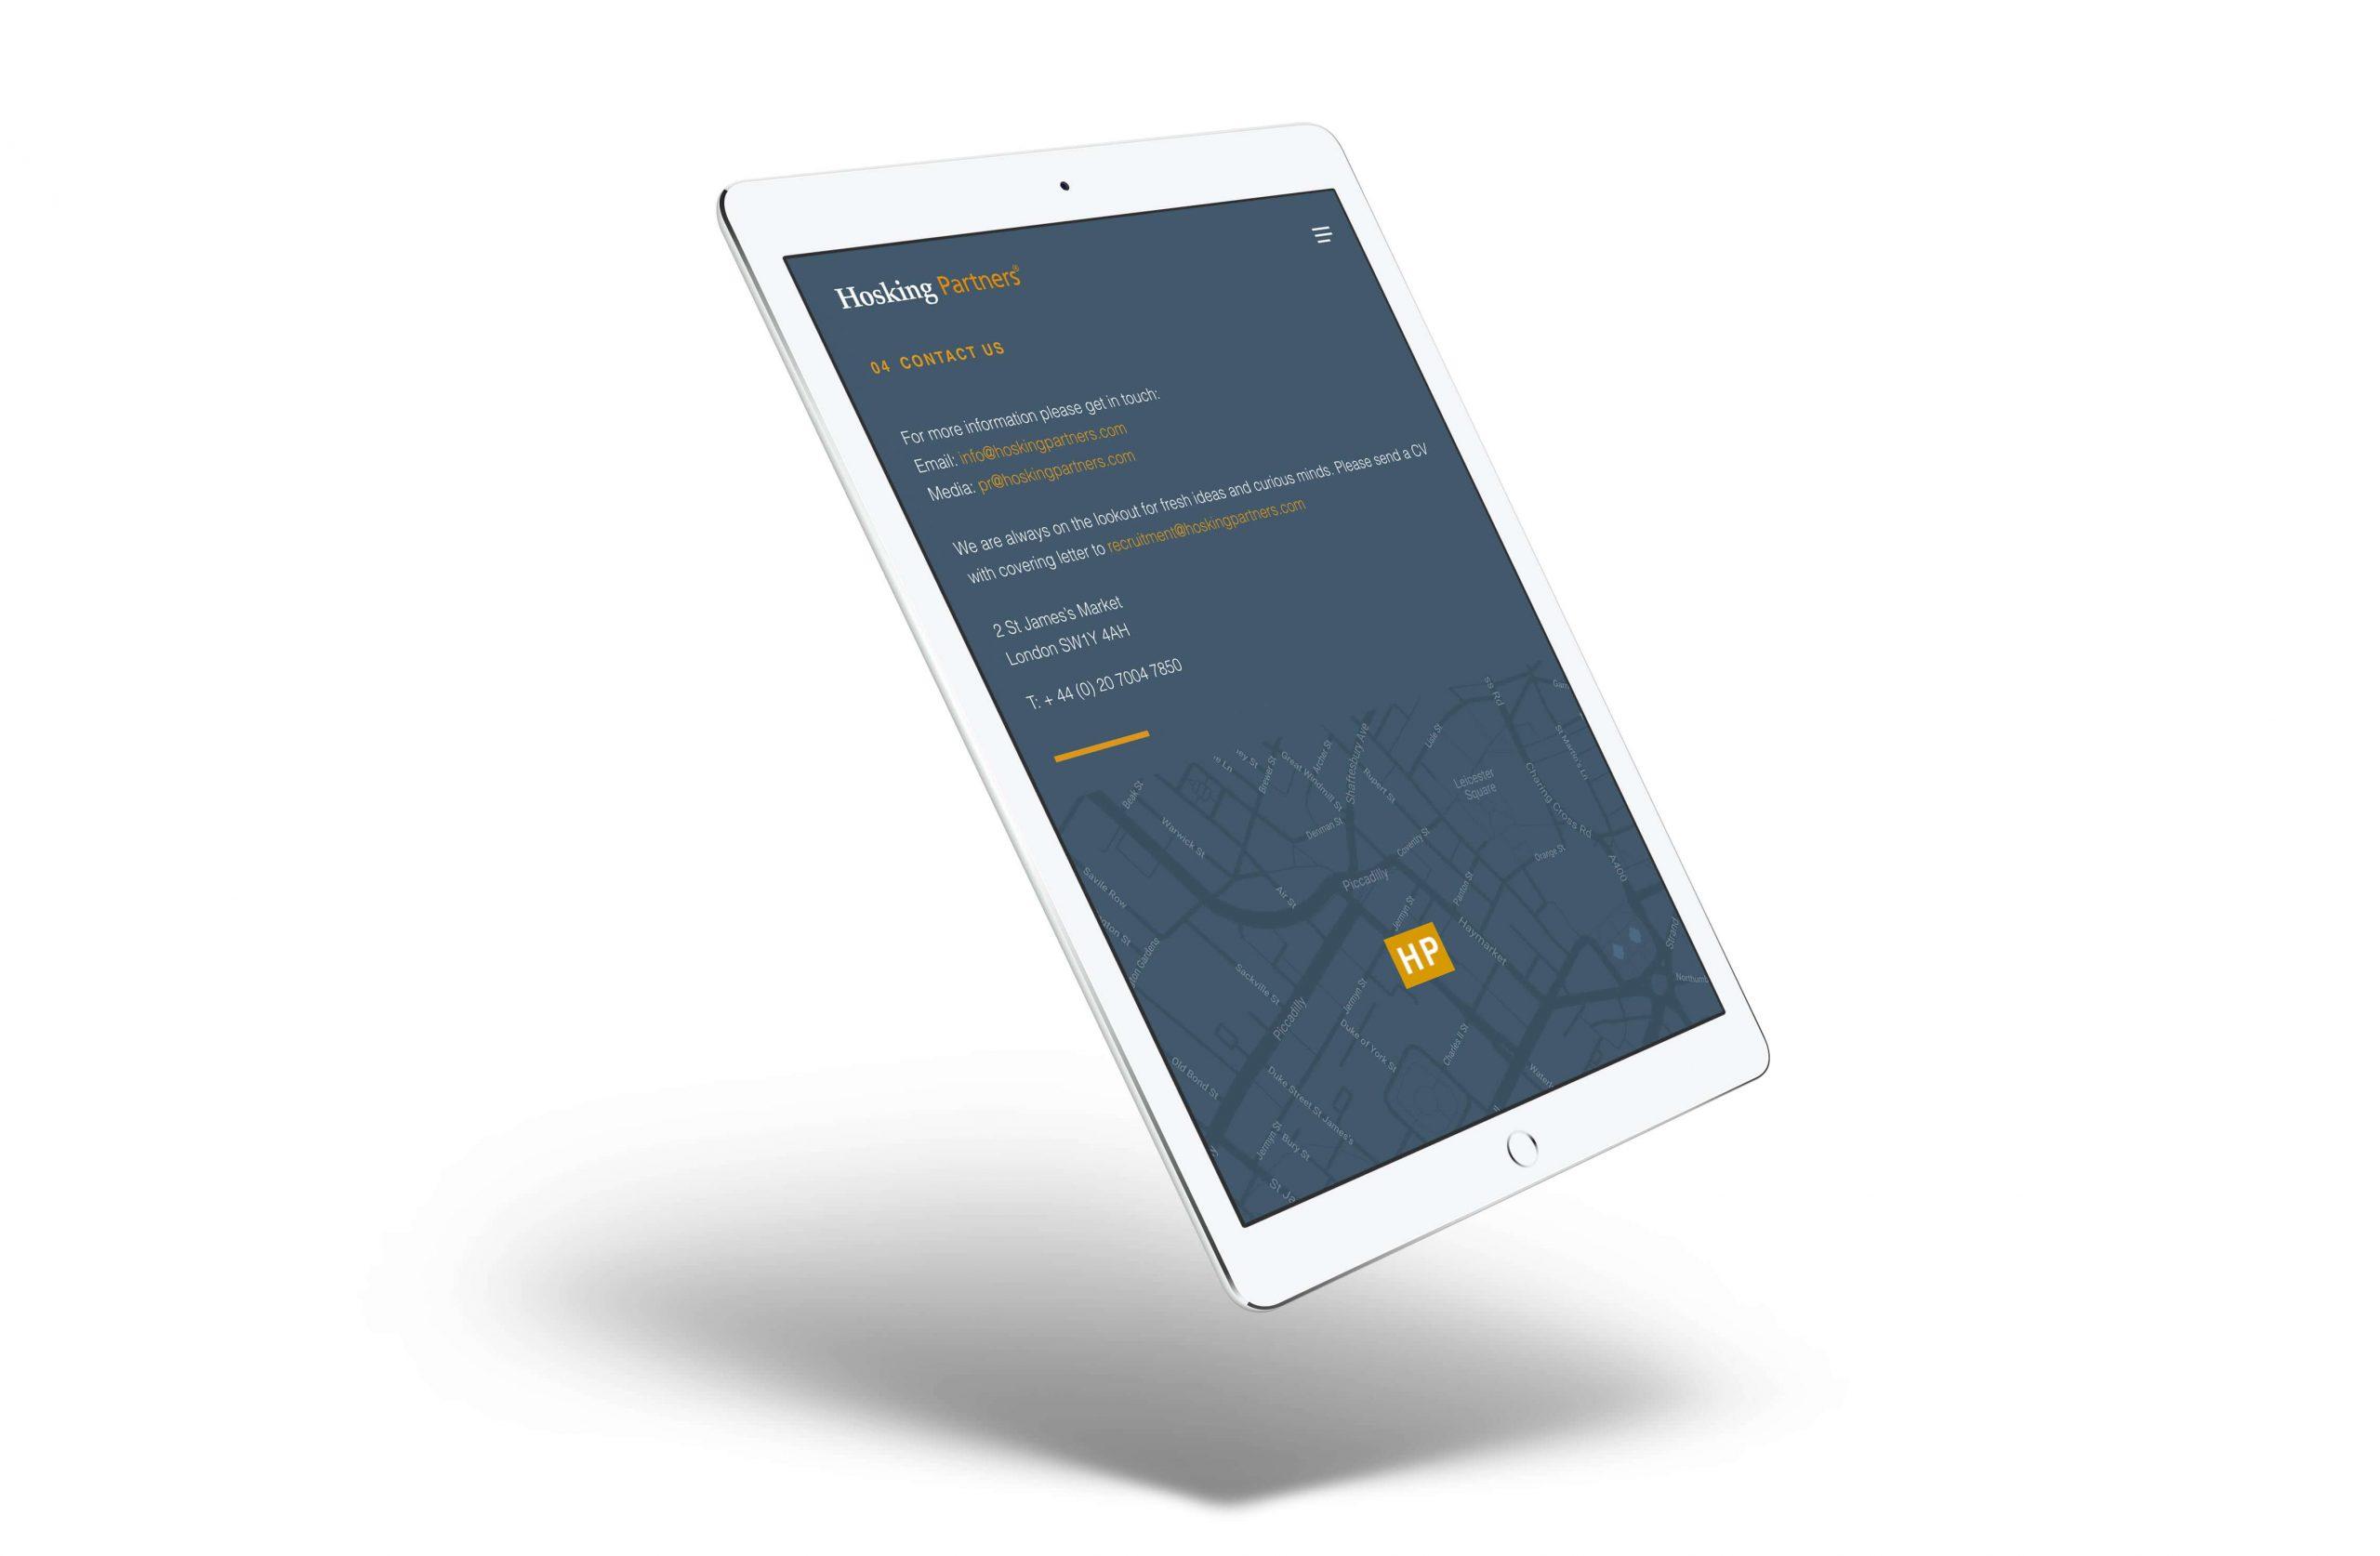 hosking partners ipad finance web design